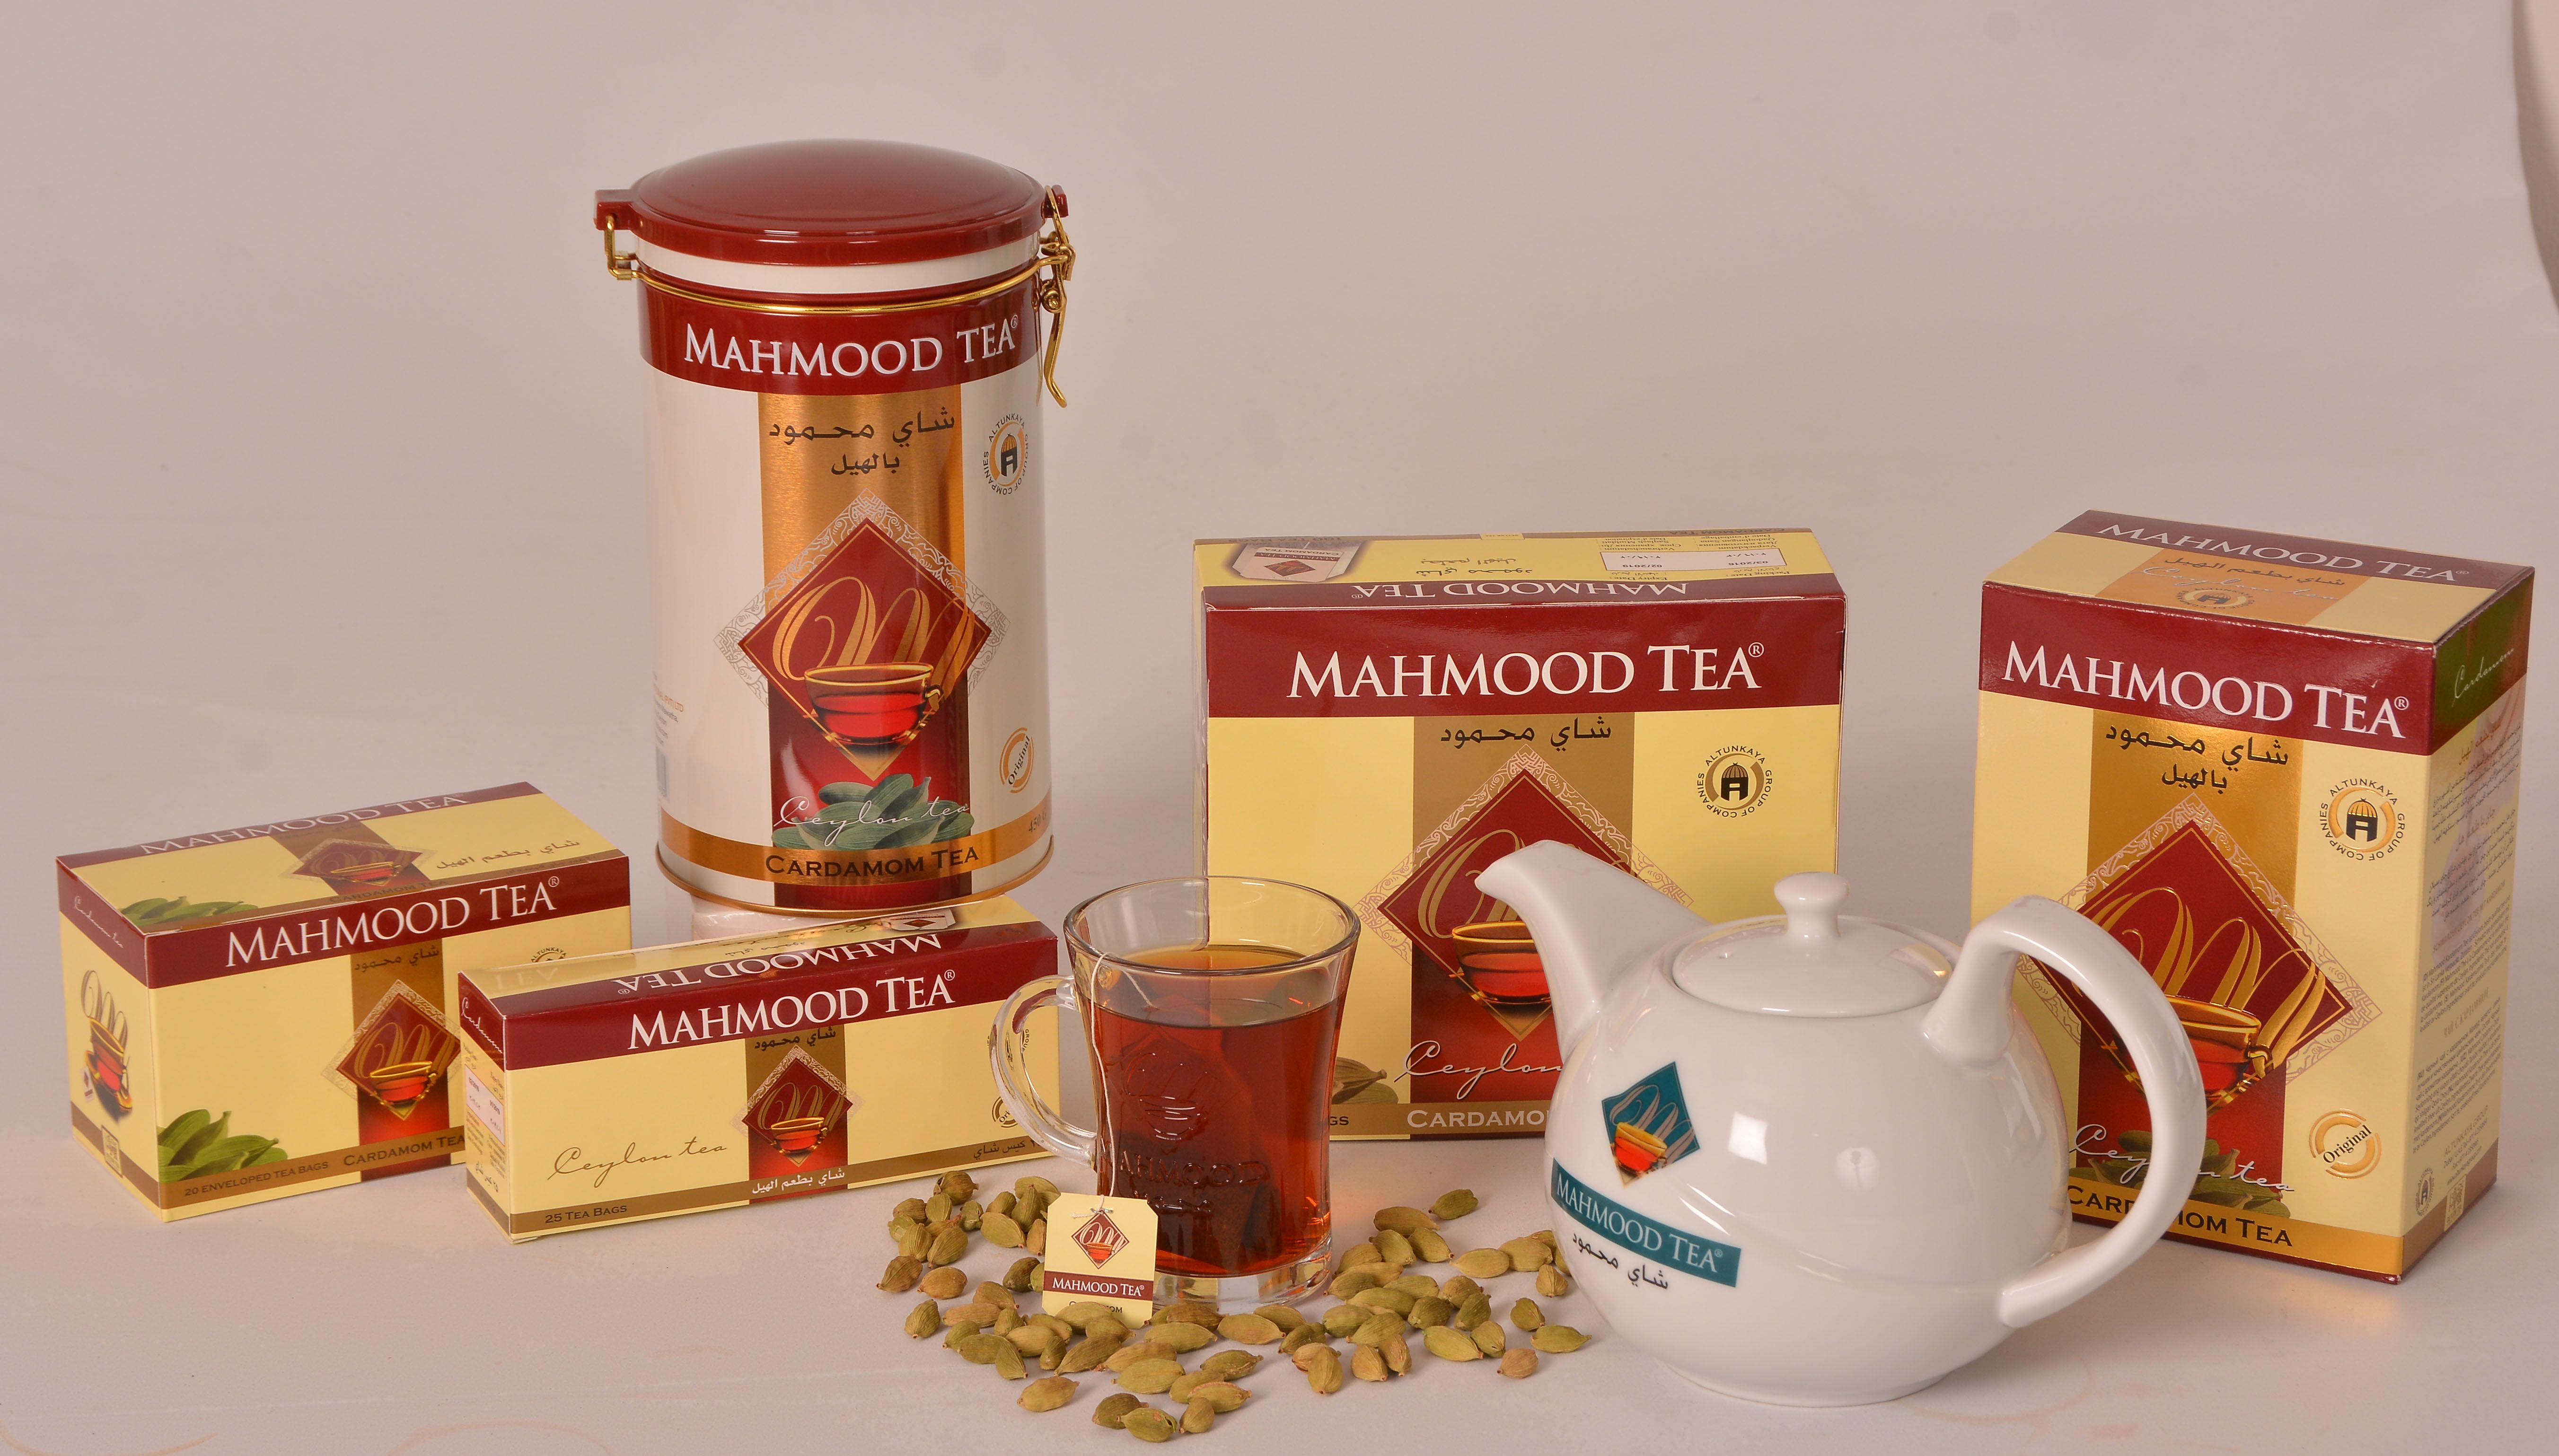 MAHMOOD CARDAMOM TEA